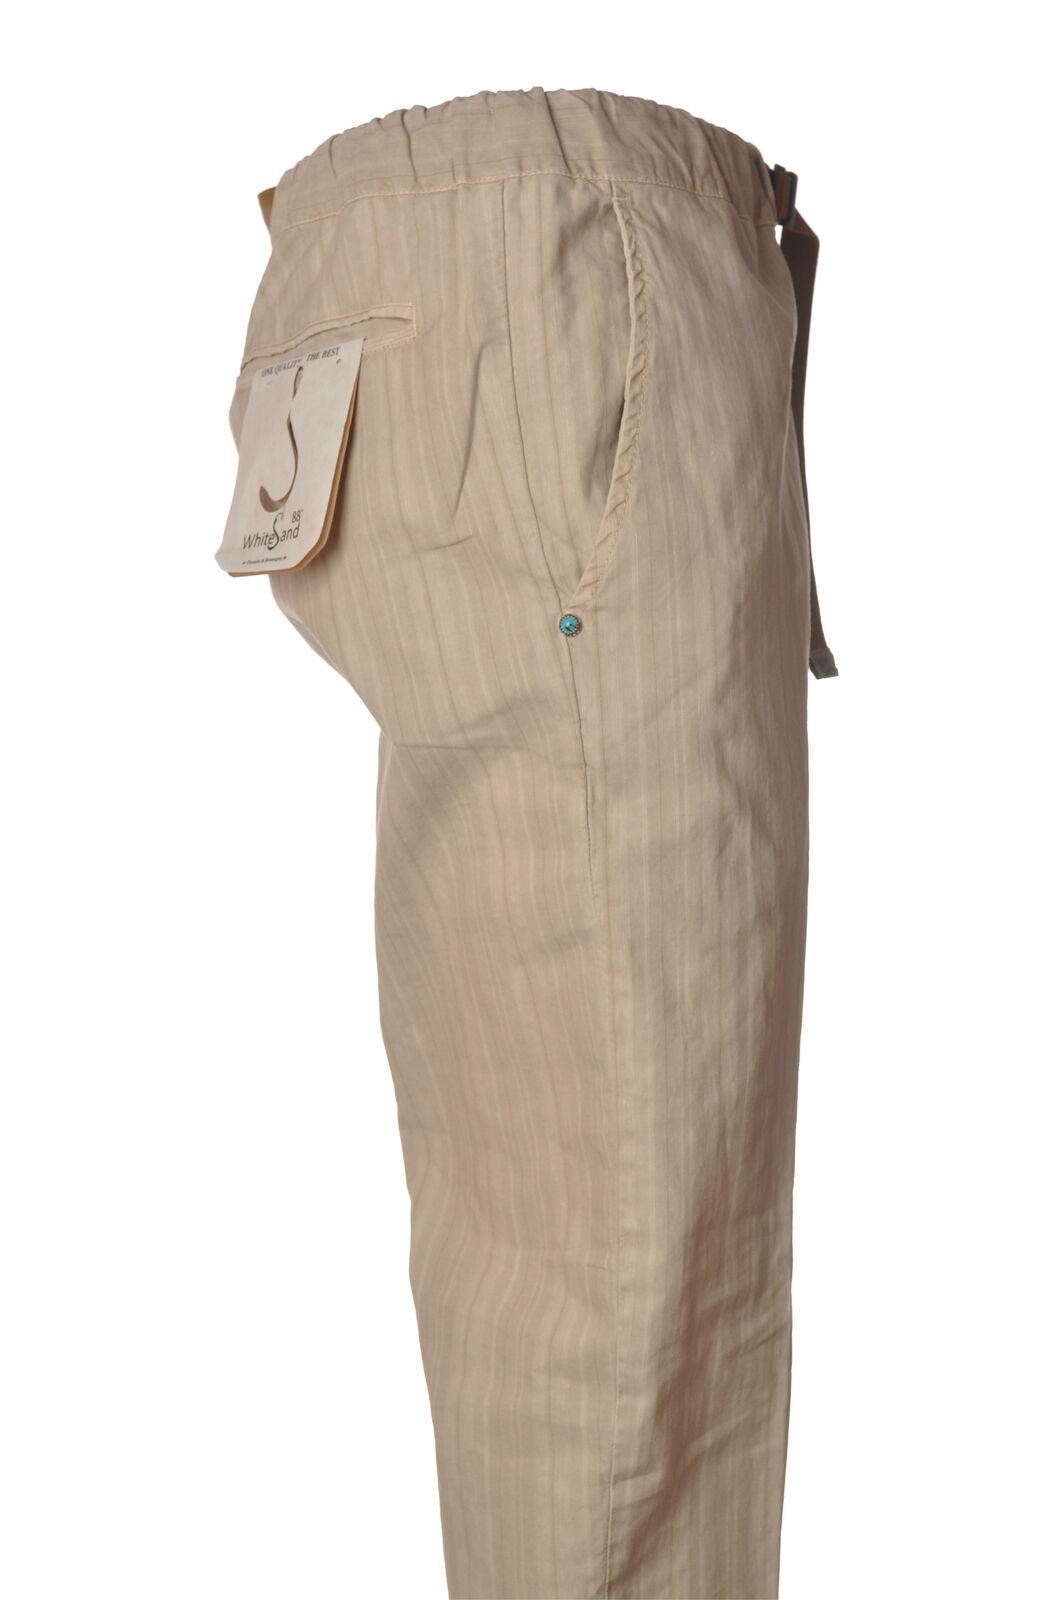 bianca sand - Pantaloni-Pantaloni - Uomo - Beige - - - 6043915C191254 6de4fb